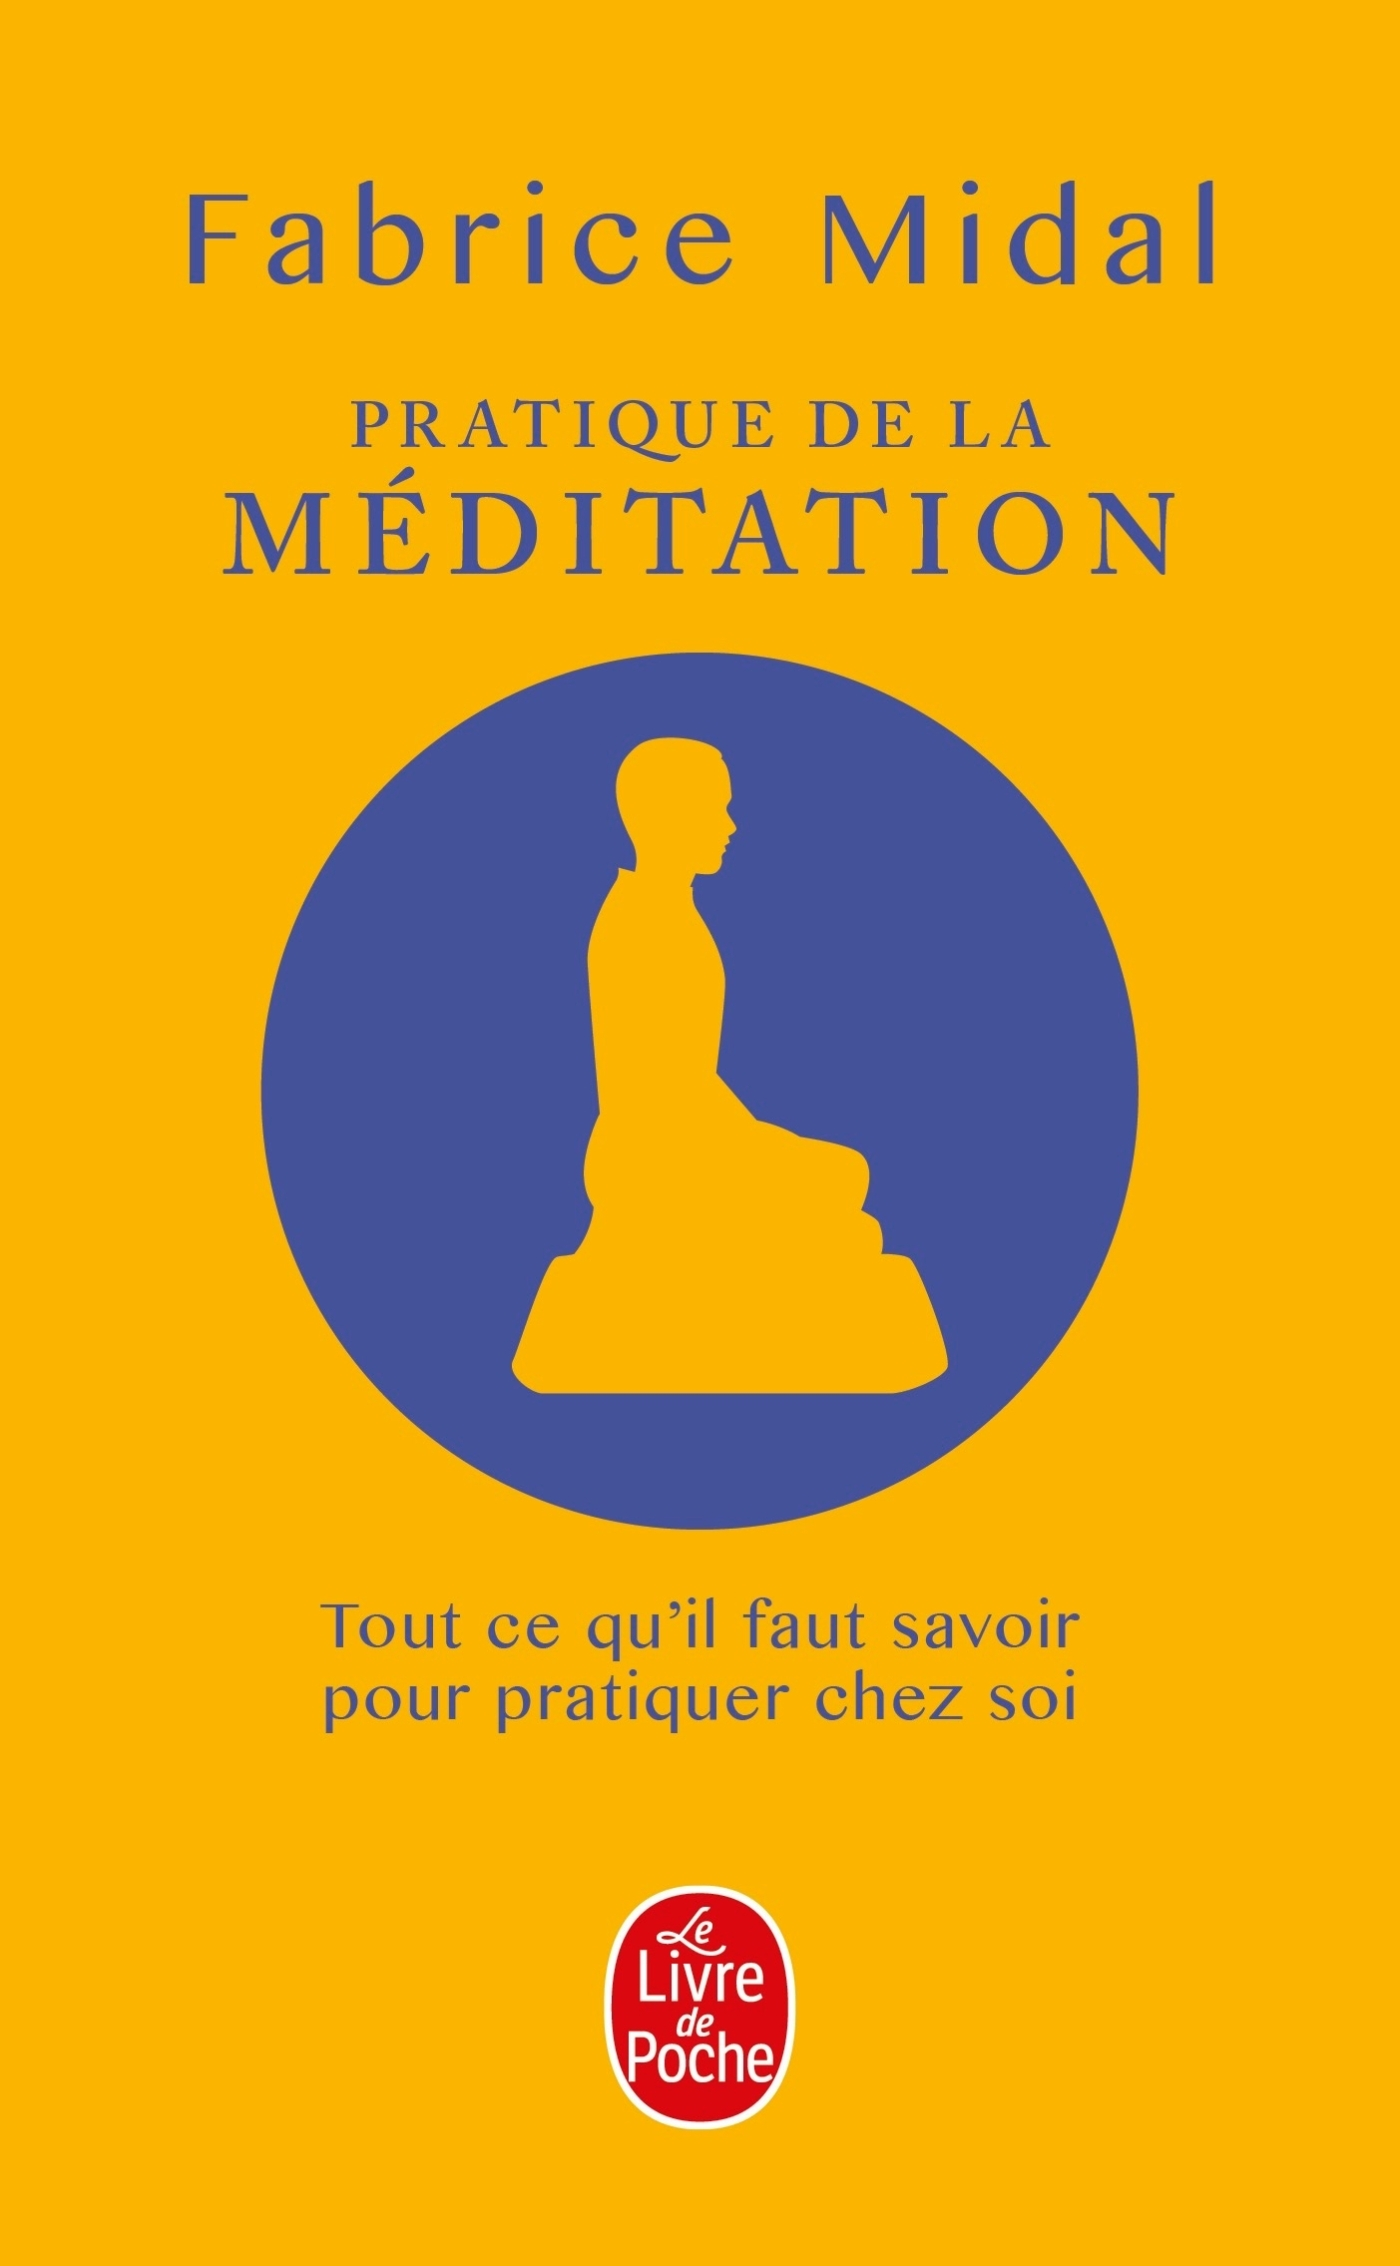 PRATIQUE DE LA MEDITATION